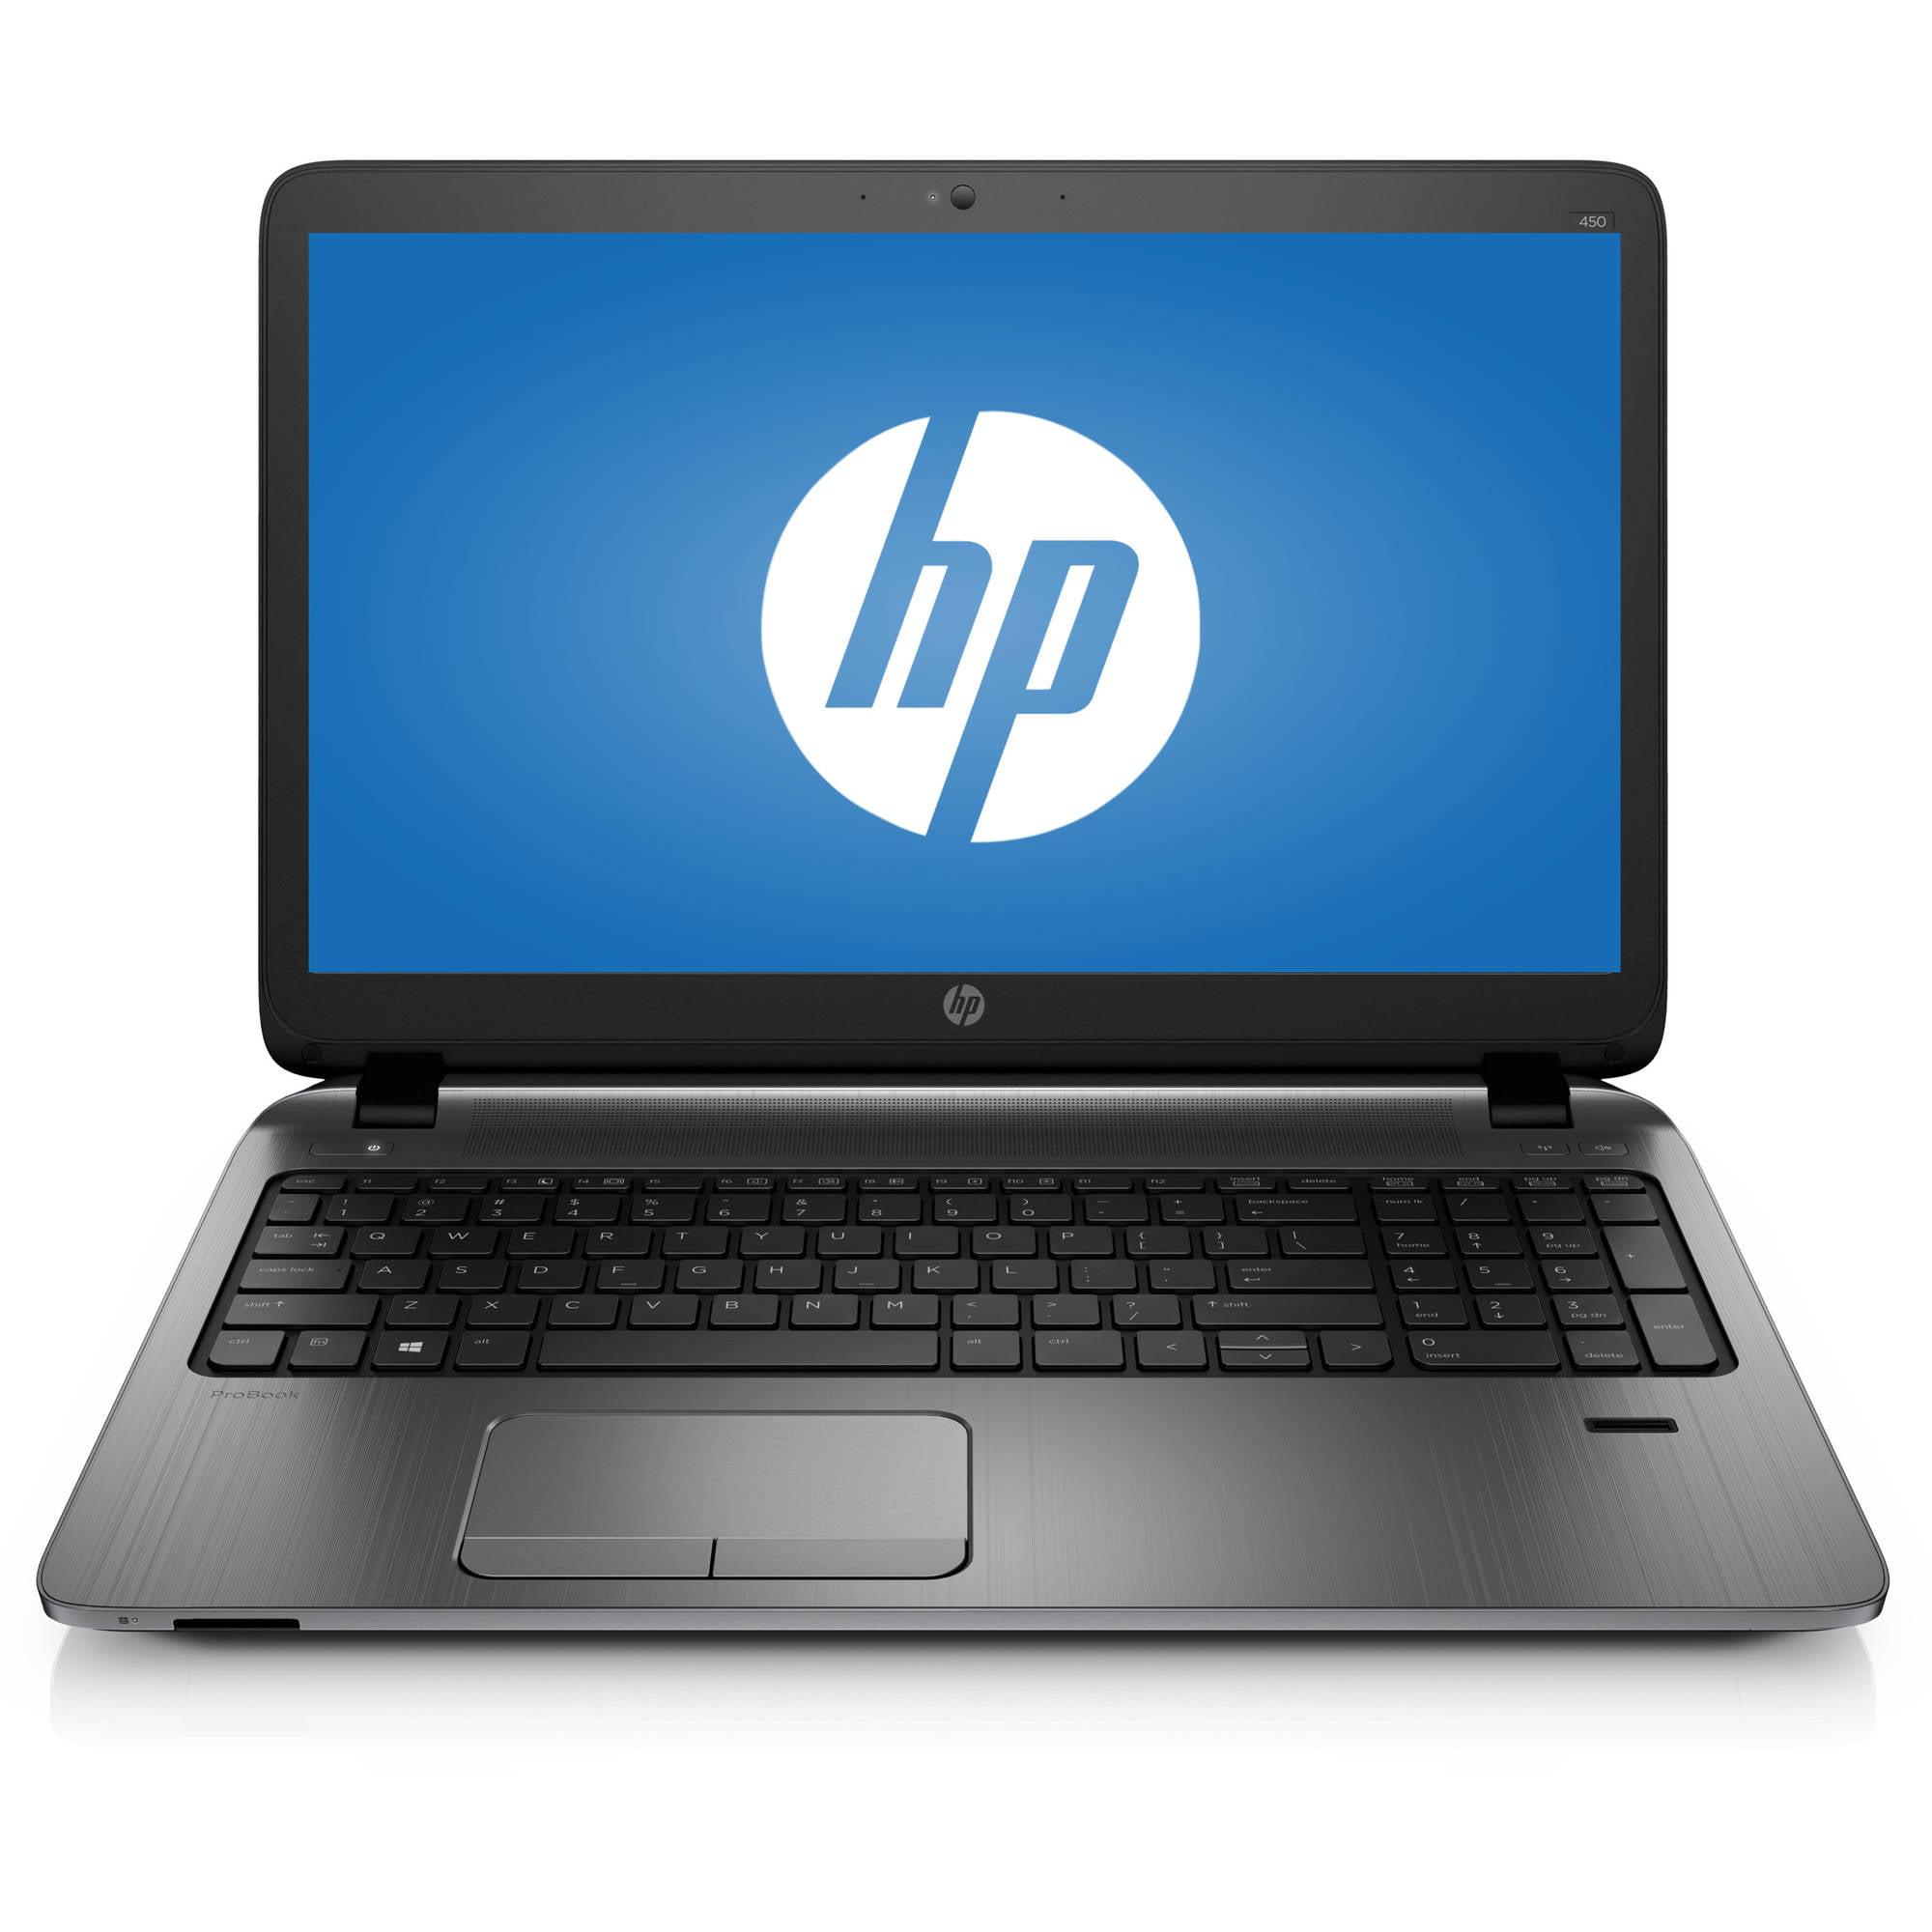 "HP ProBook 450 G2 V1H28UT#ABA 15.6"" Laptop, Windows 7 Professional, Intel Core i3-5005U Dual-Core Processor, 4GB RAM, 500GB Hard Drive"